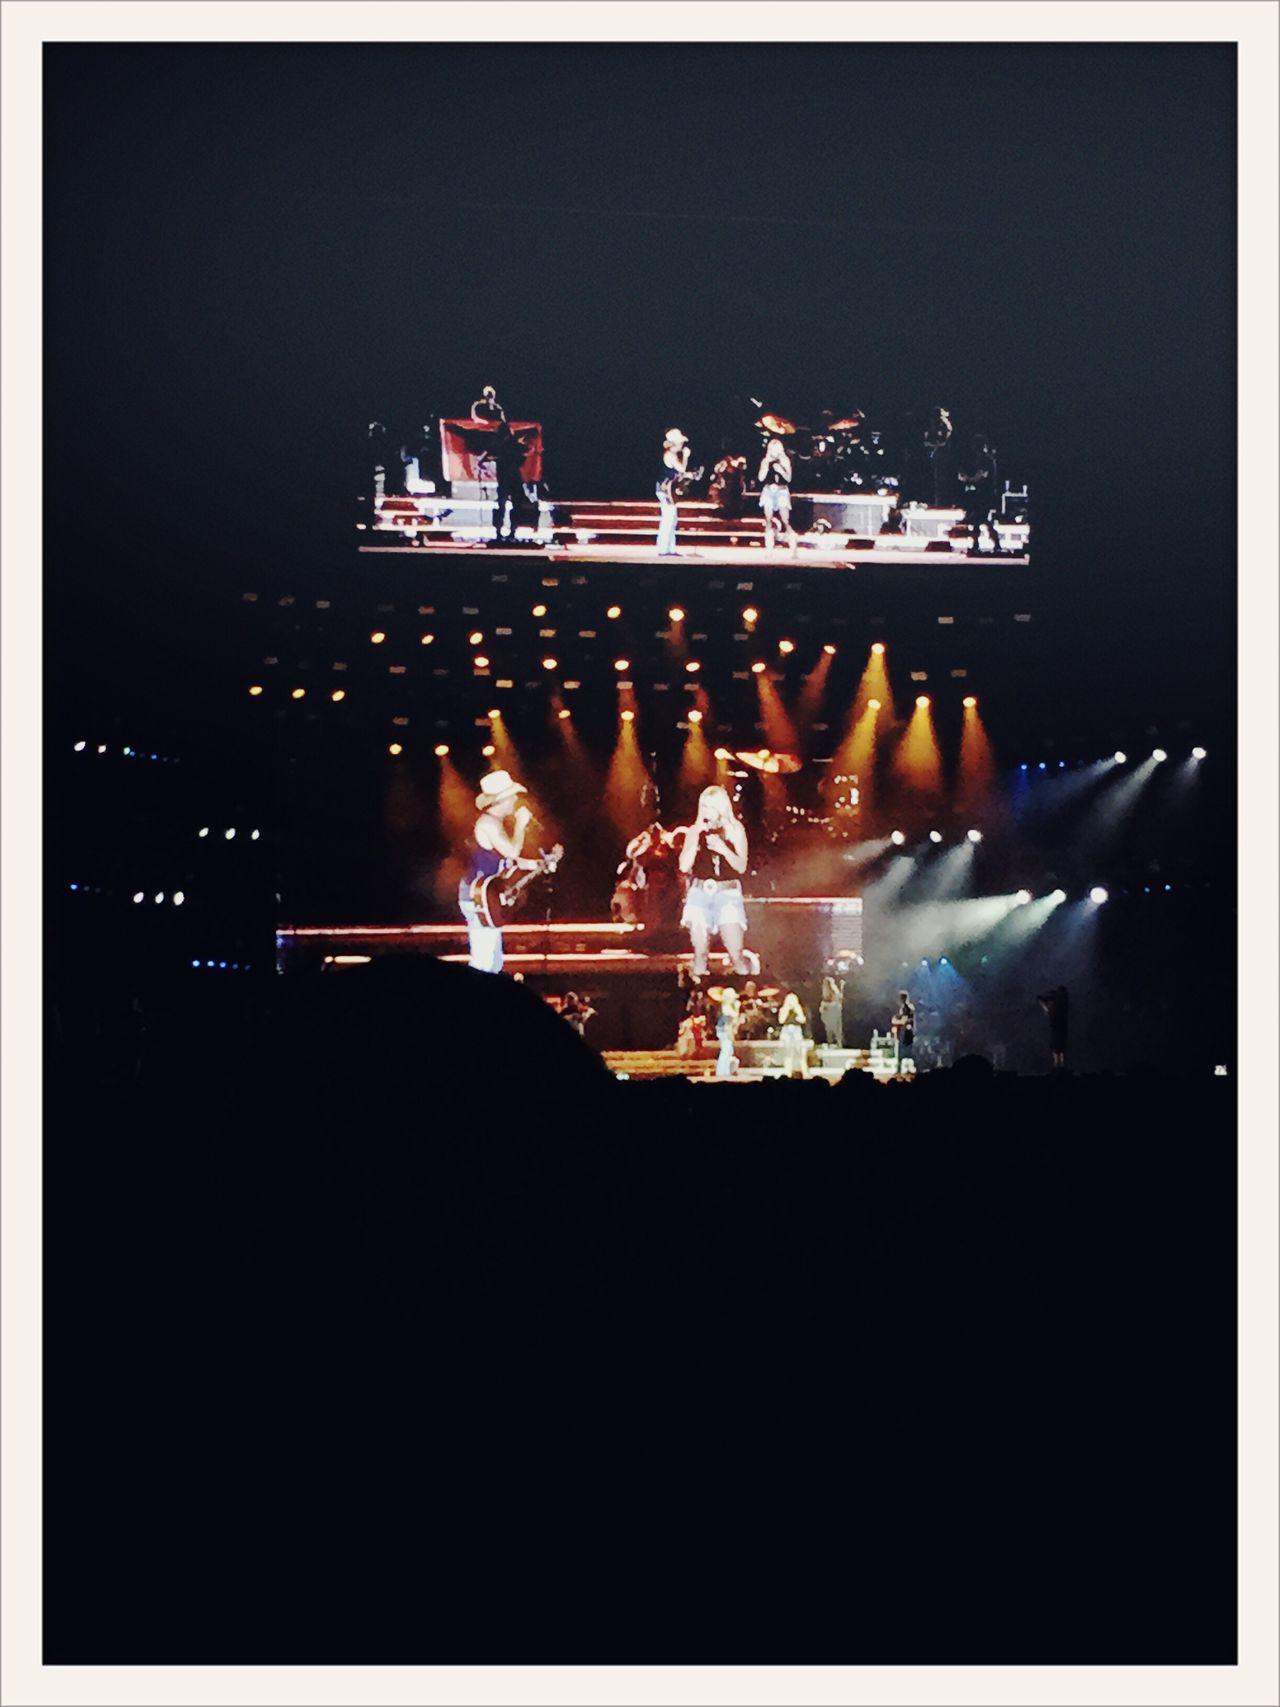 Country Fest: Kenney Chesney & Miranda Lambert Country Fest Best Of EyeEm NEM Mood Summer2016 Best EyeEm Shot AMPt_community Summer Concerts Kenney Chesney Miranda Lambert